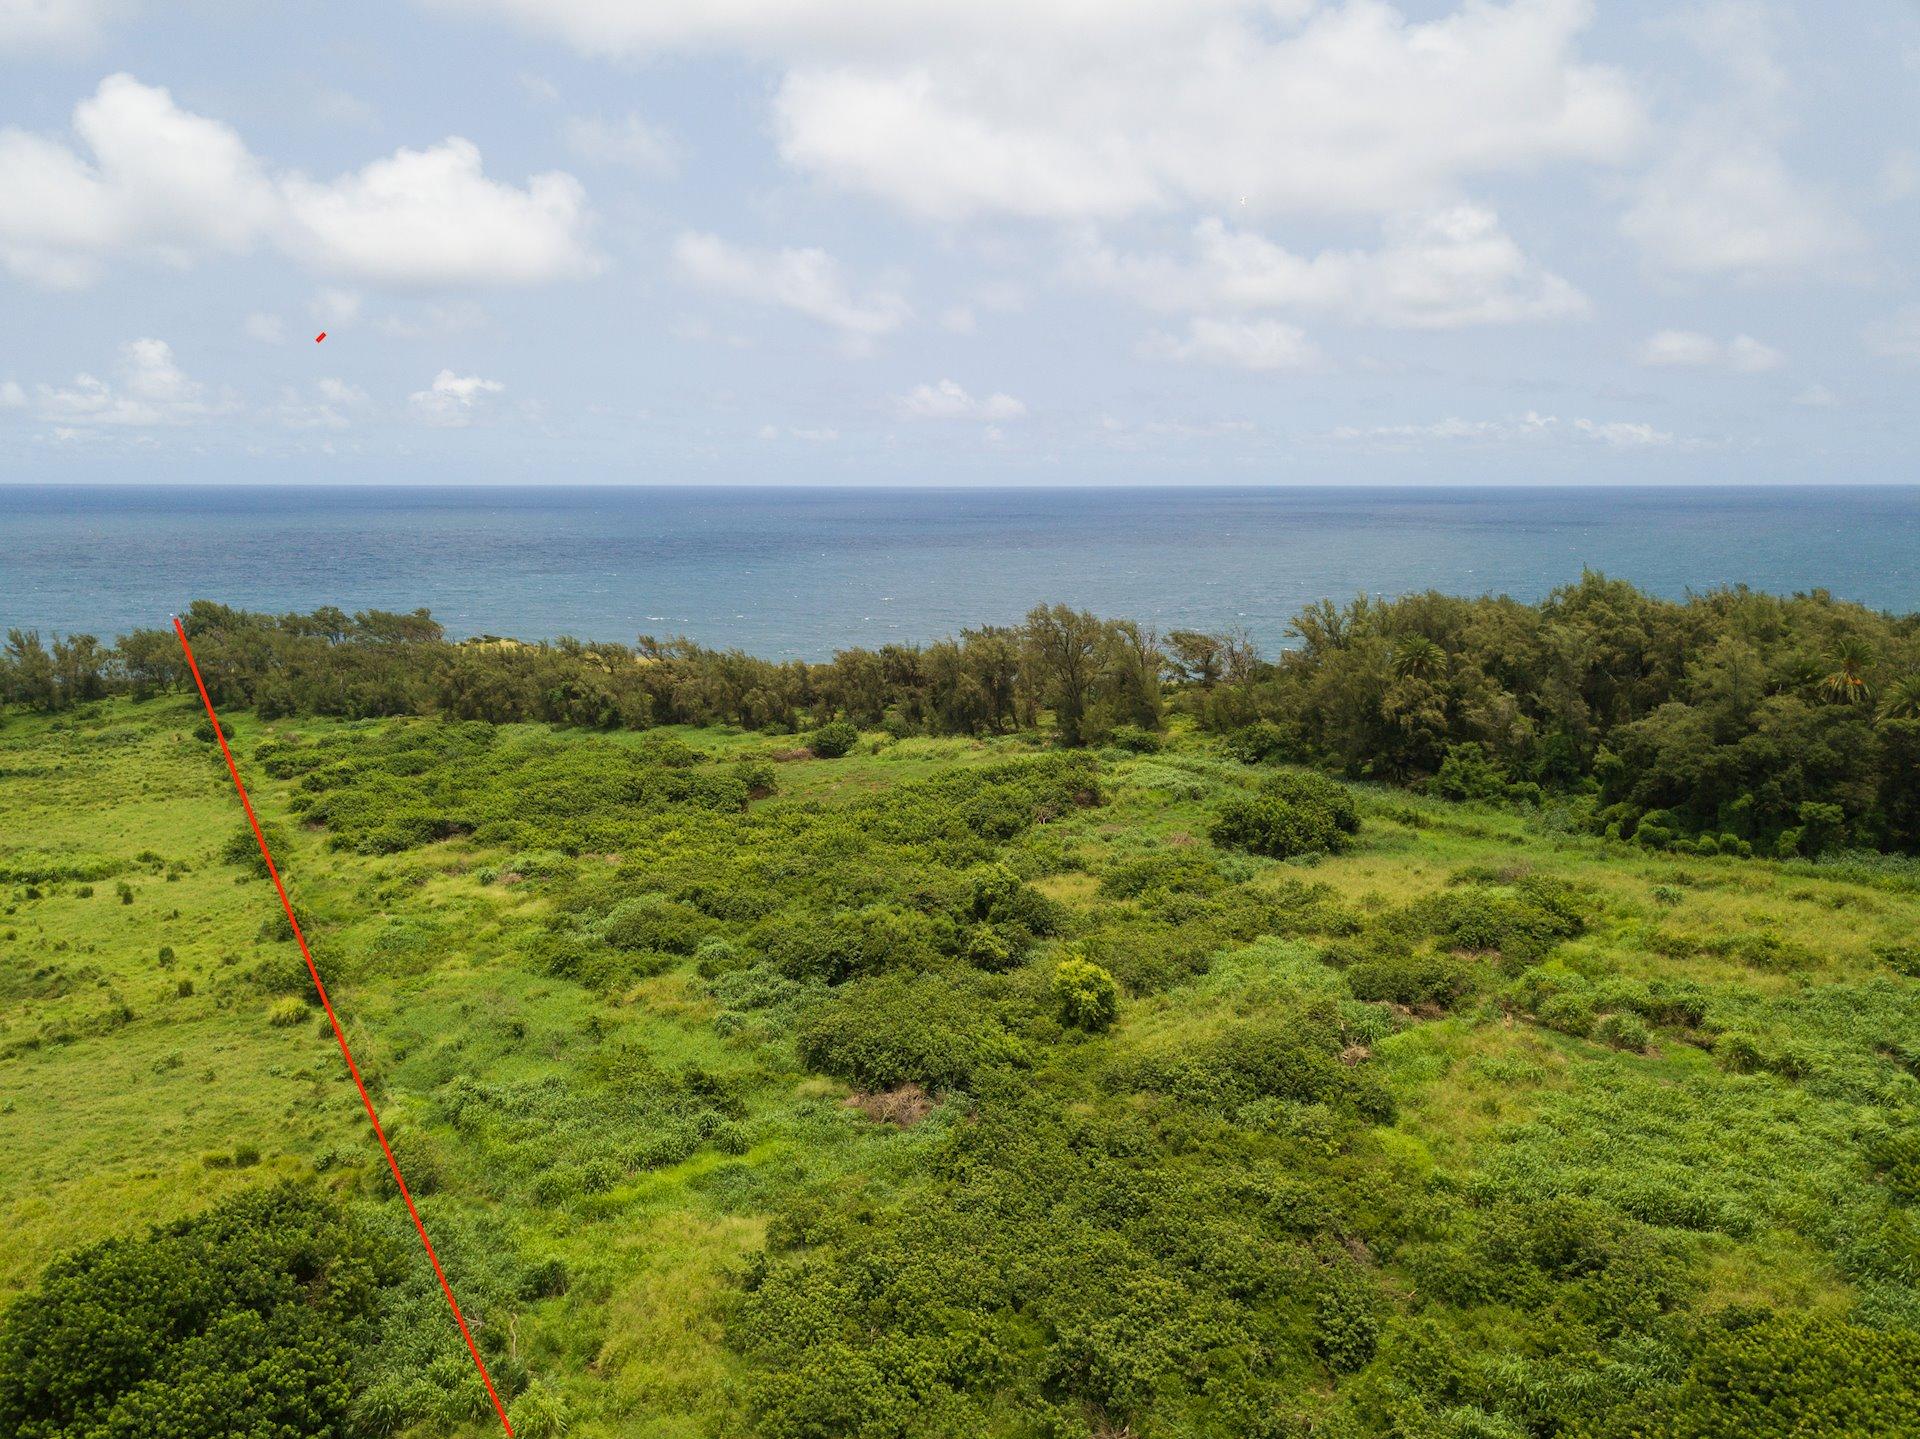 Distant views of Maui